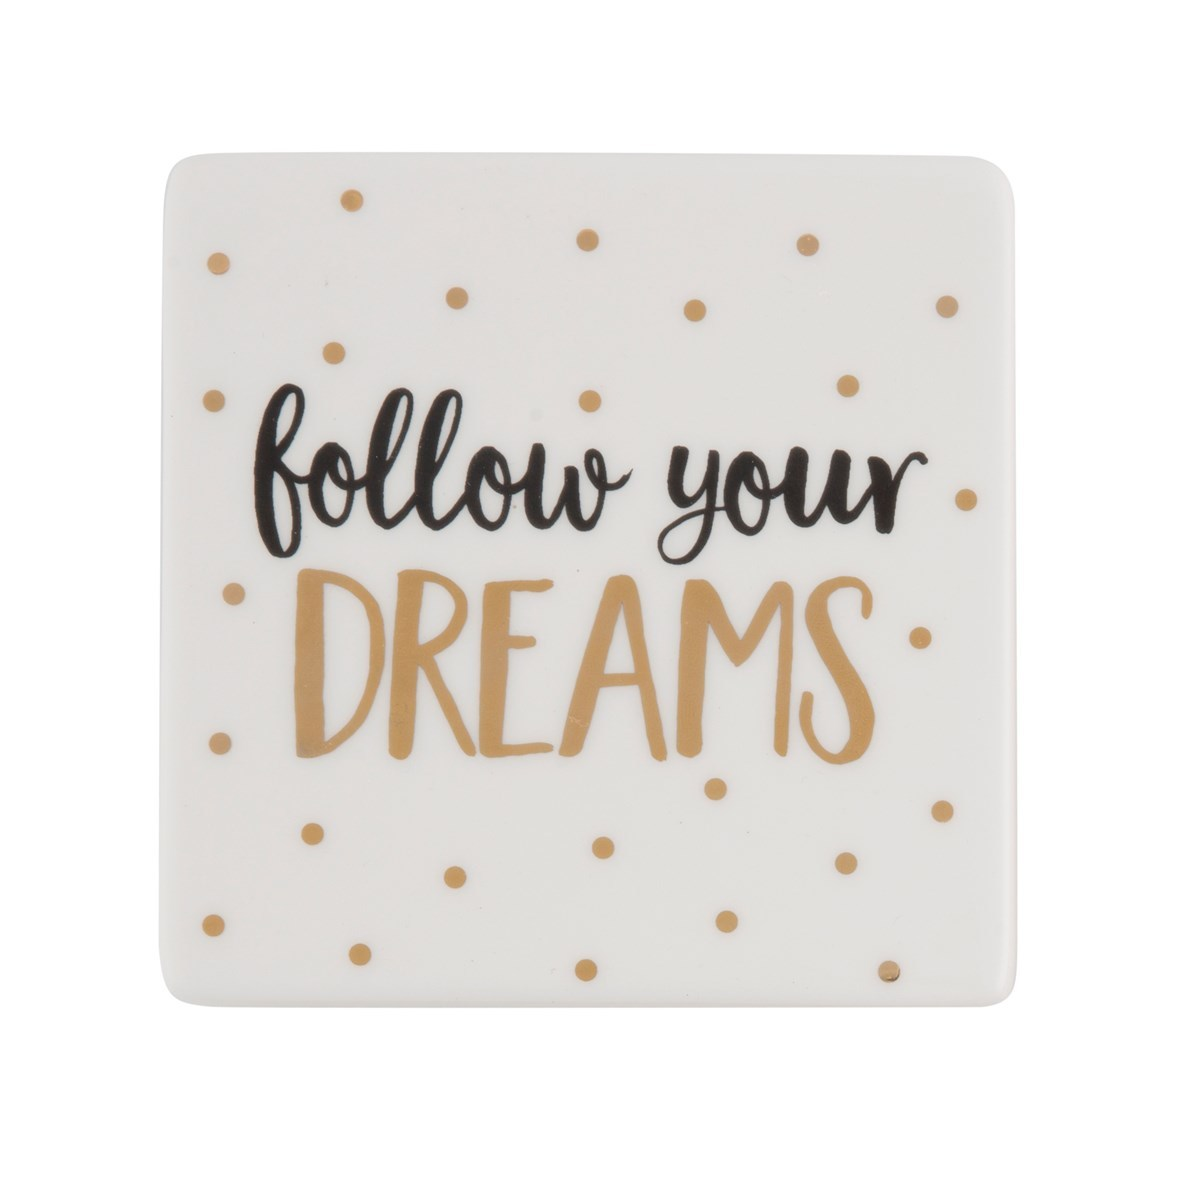 Dreams Metallic Monochrome Coaster image